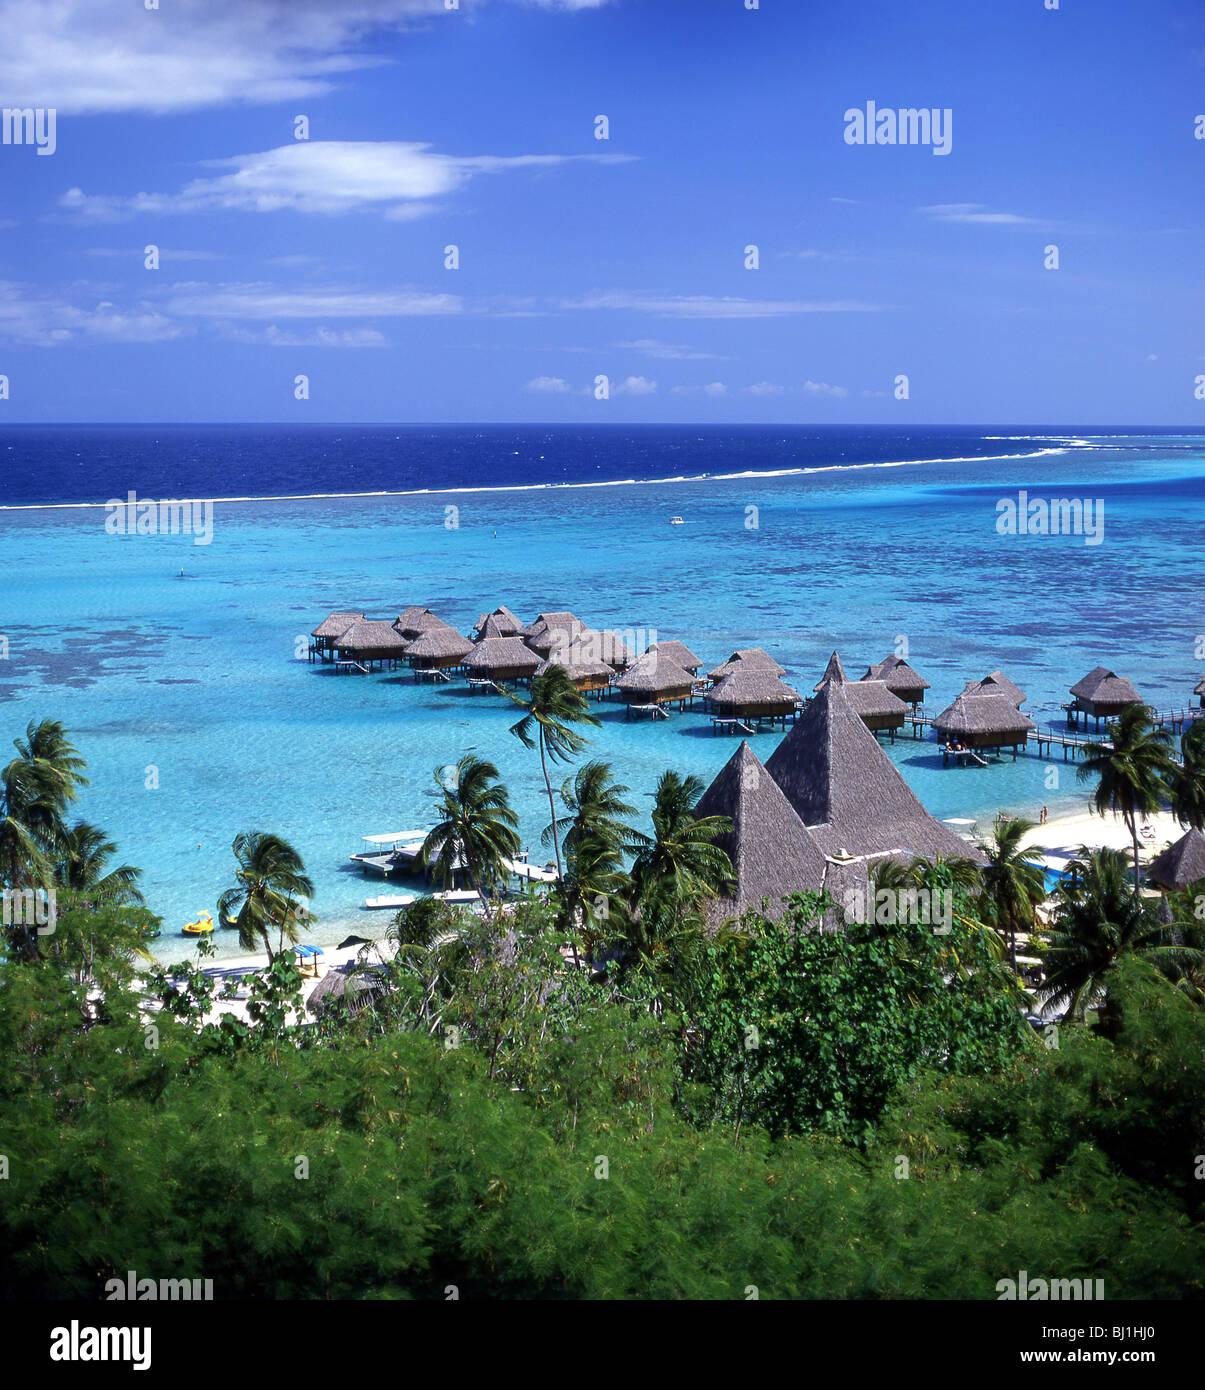 View Of Cabins Over Sea Sofitel Hotel Moorea Tahiti